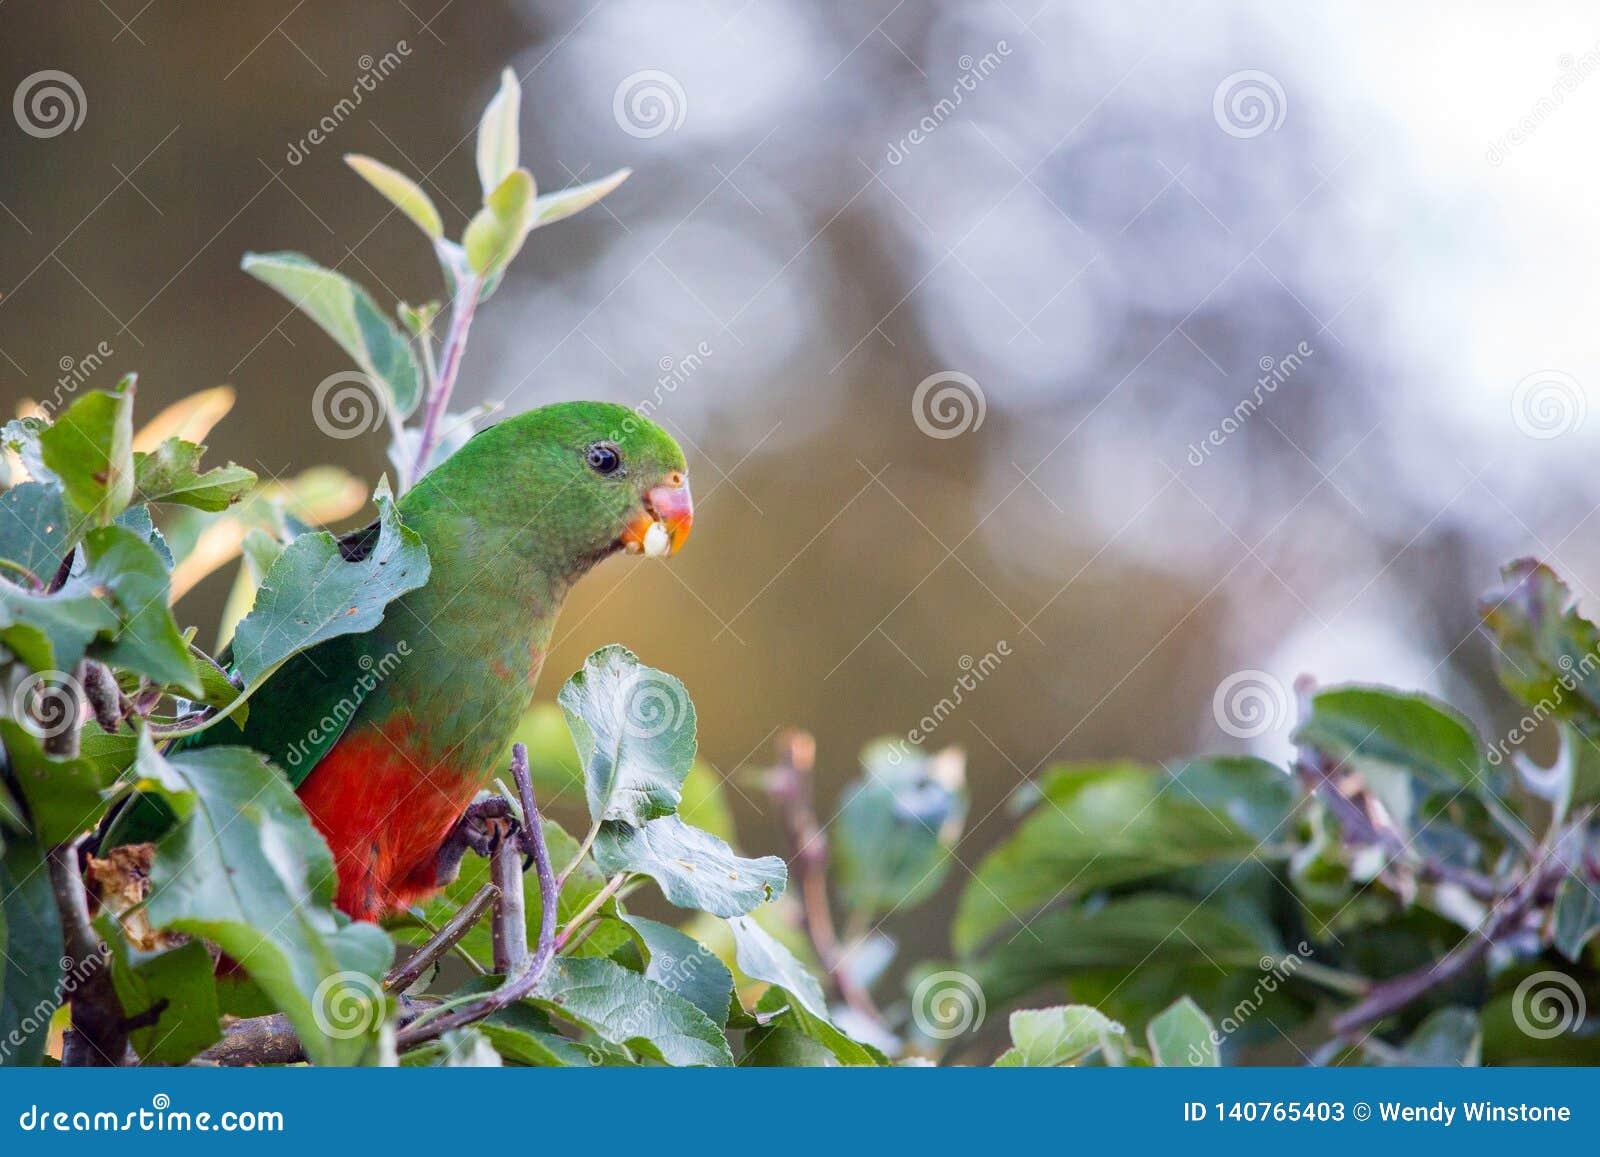 king parrot in apple tree with apple in beak